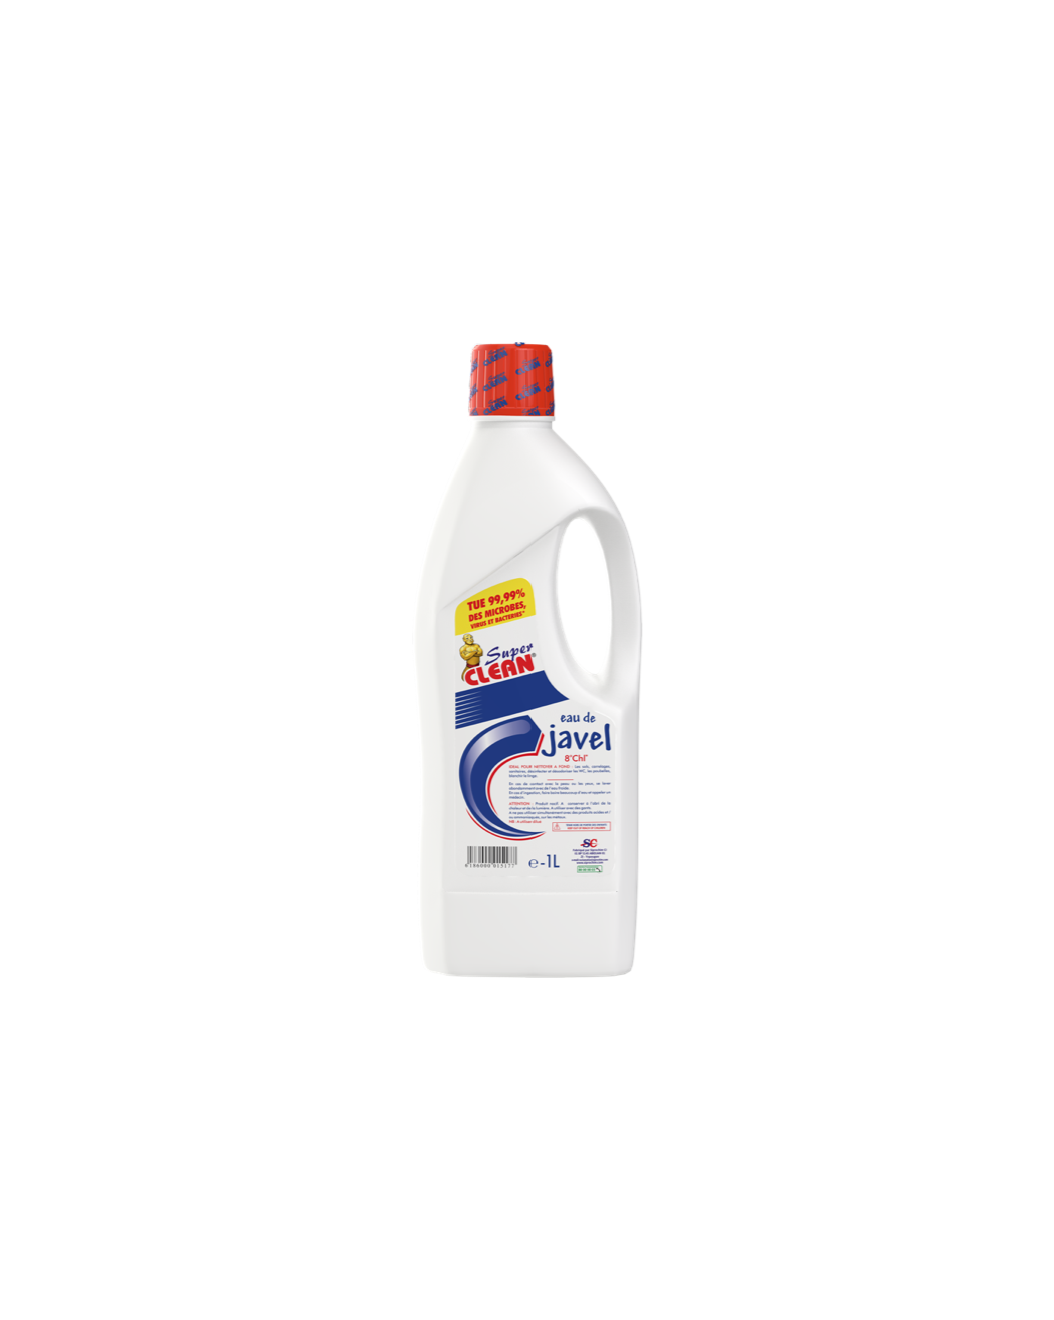 SUPER CLEAN_Eau de Javel 8° 1L